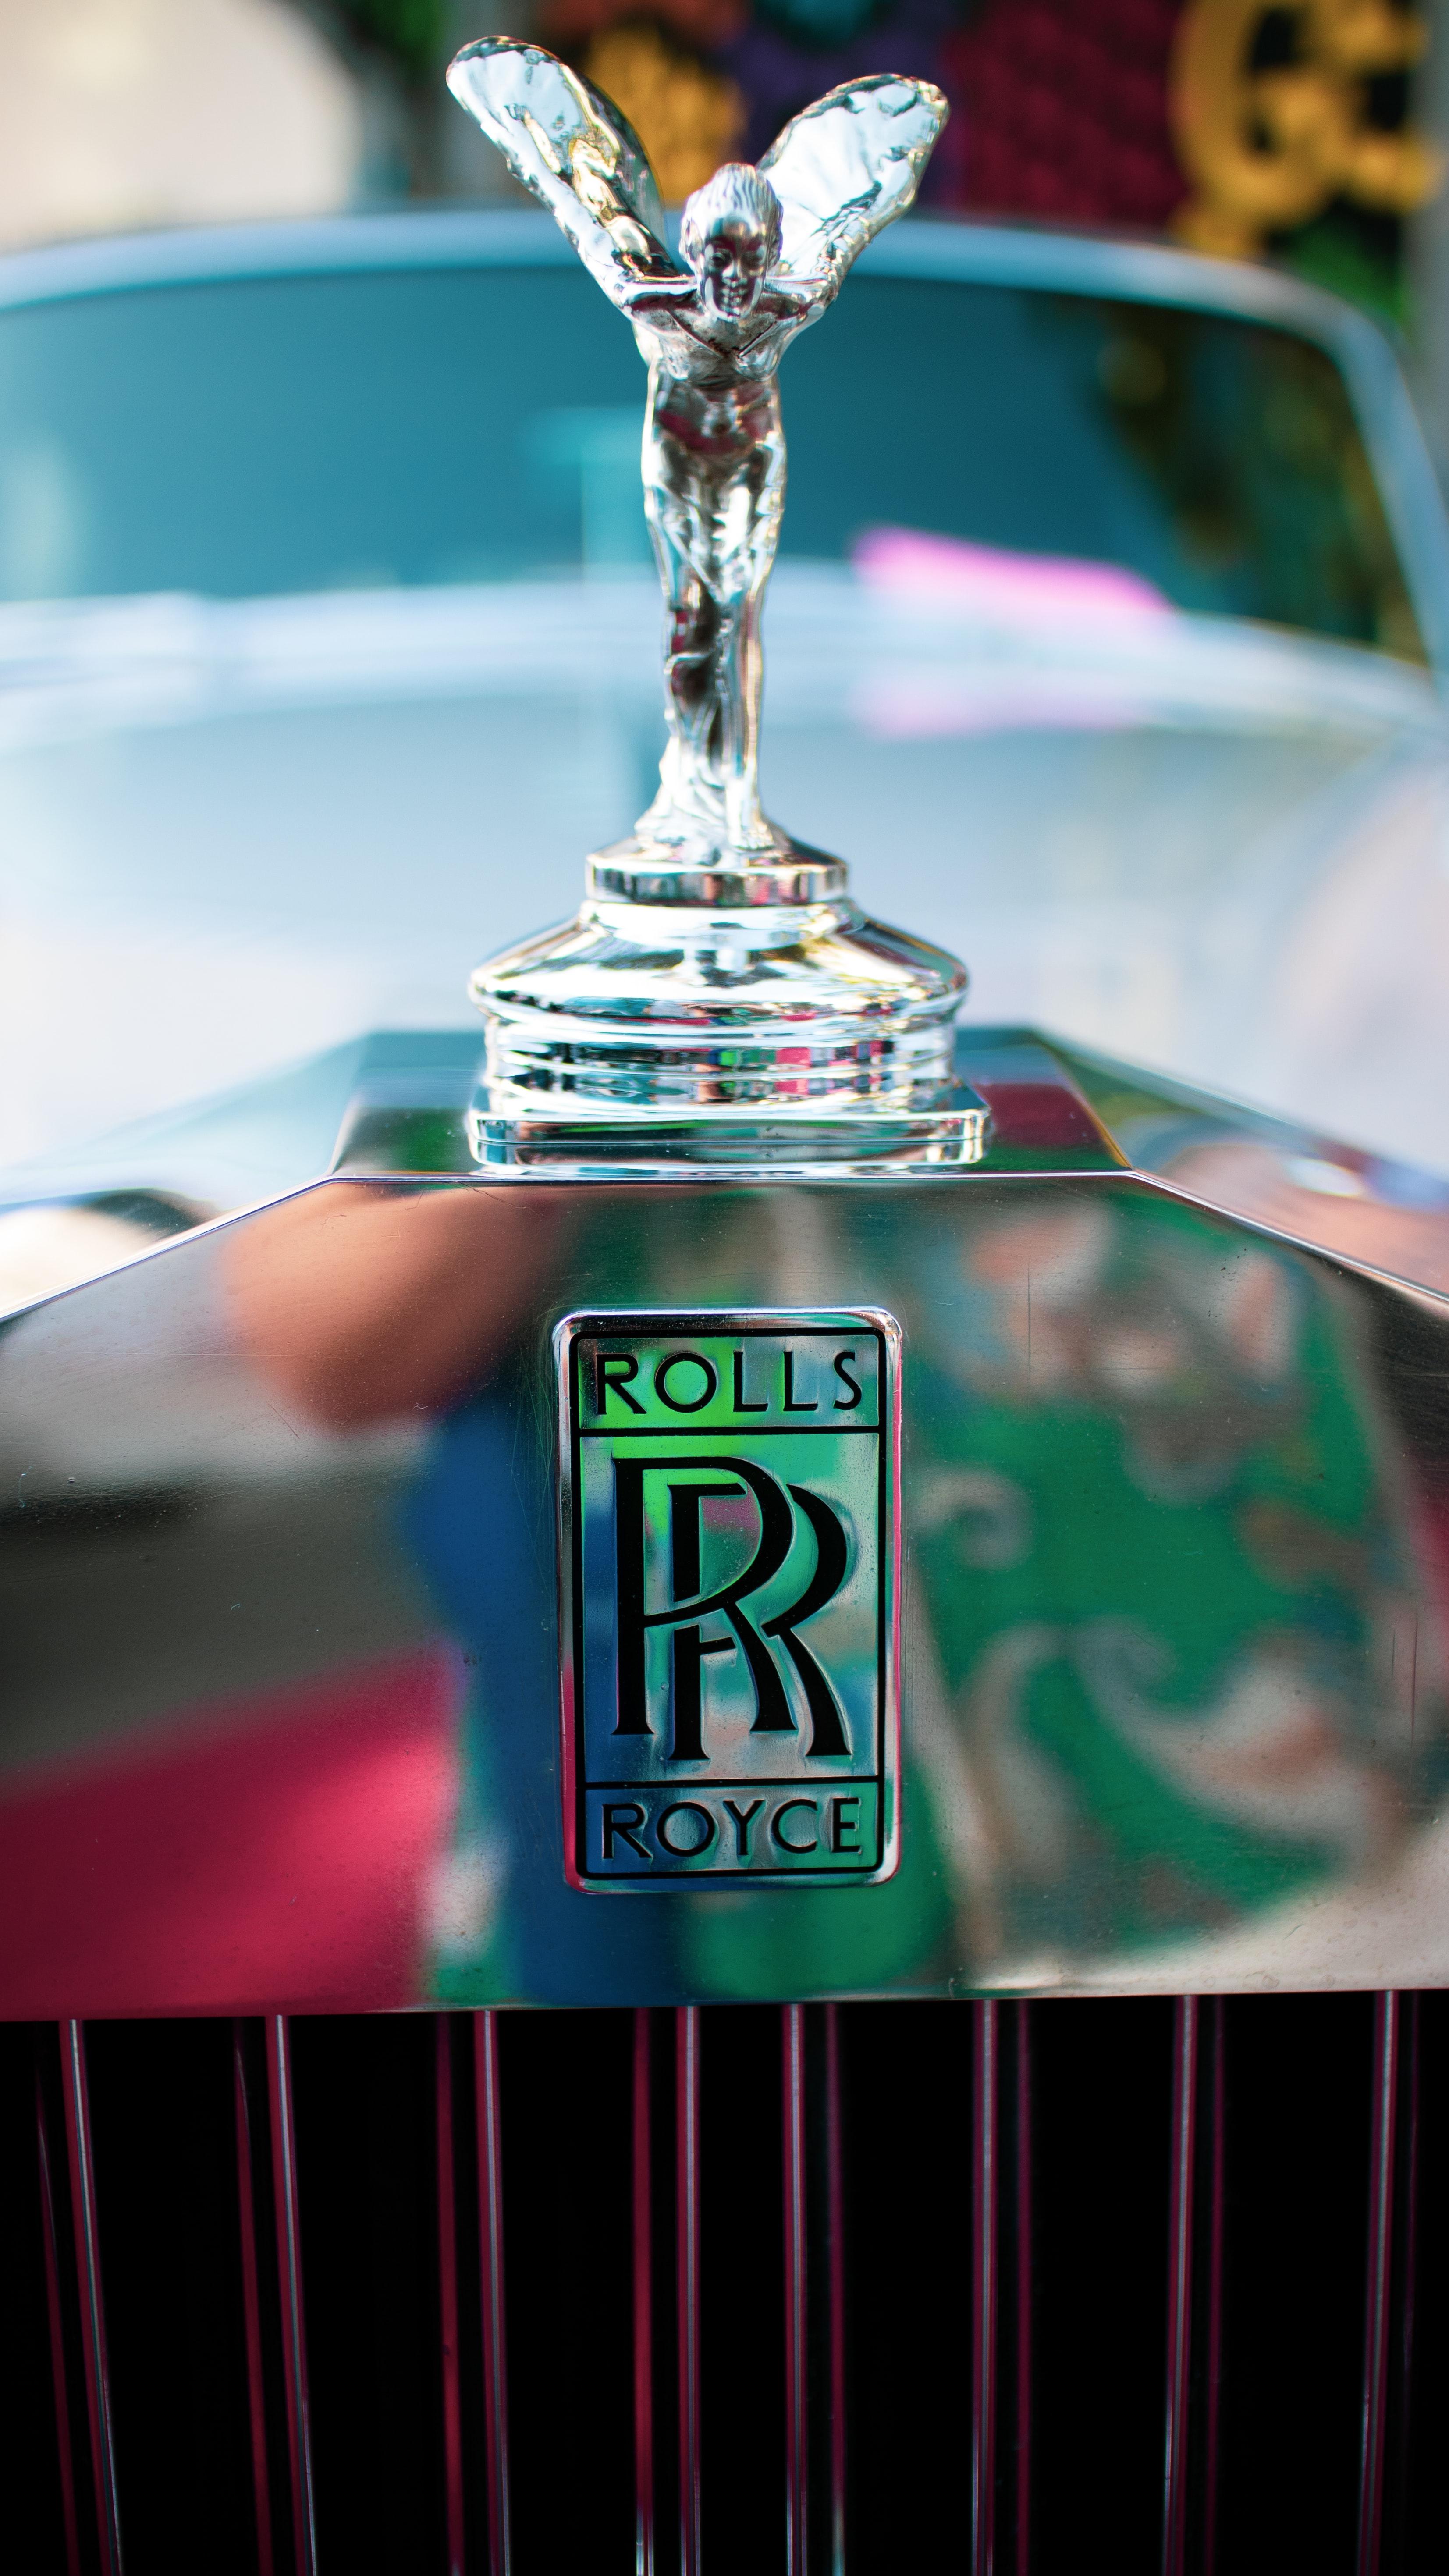 Rolls Royce Logo Pictures Download Free Images On Unsplash